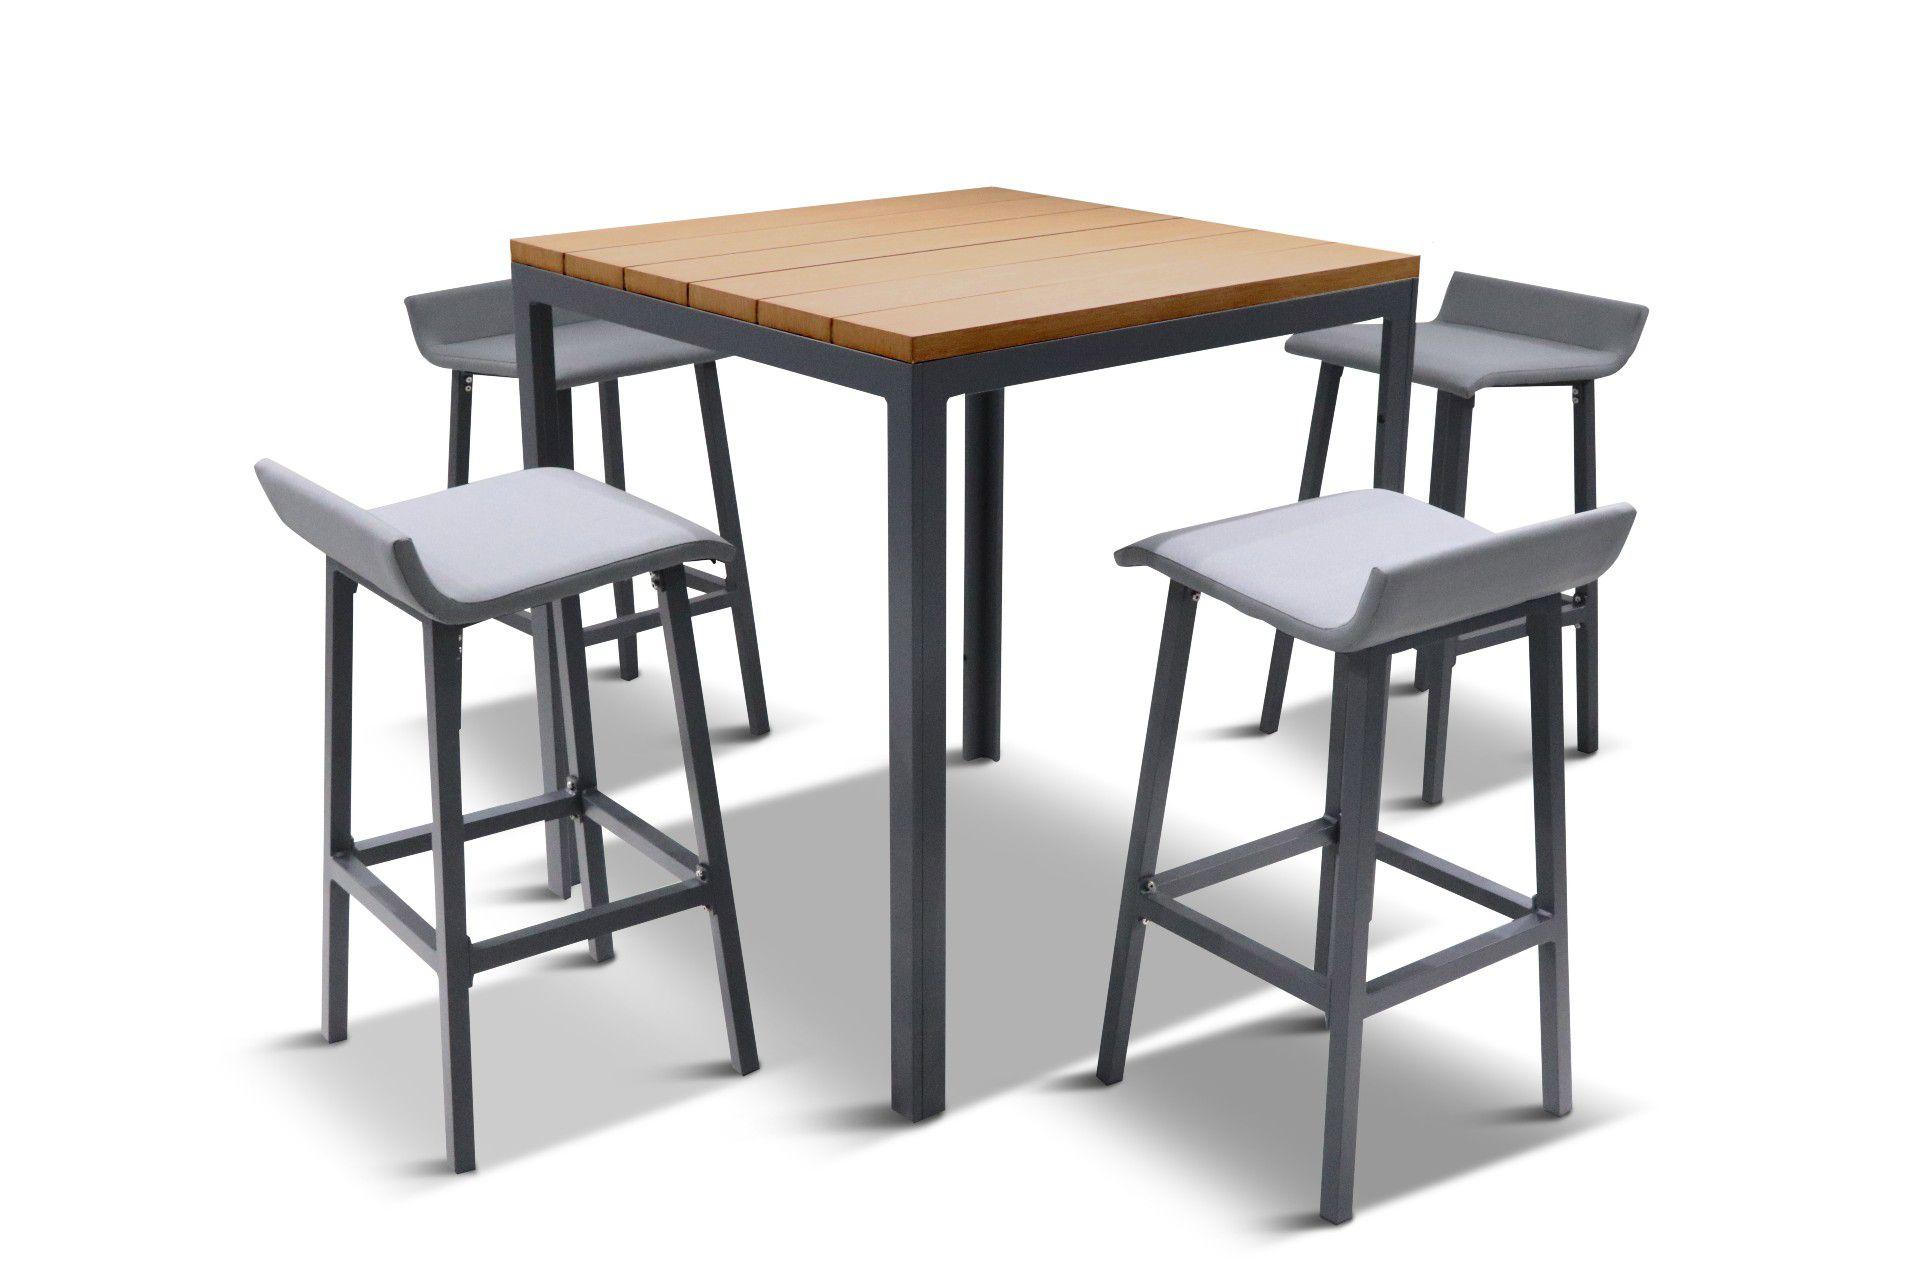 LG Outdoor Siena 4-Seat Wood-Effect High Garden Dining Table & Bar Stools Set, Grey